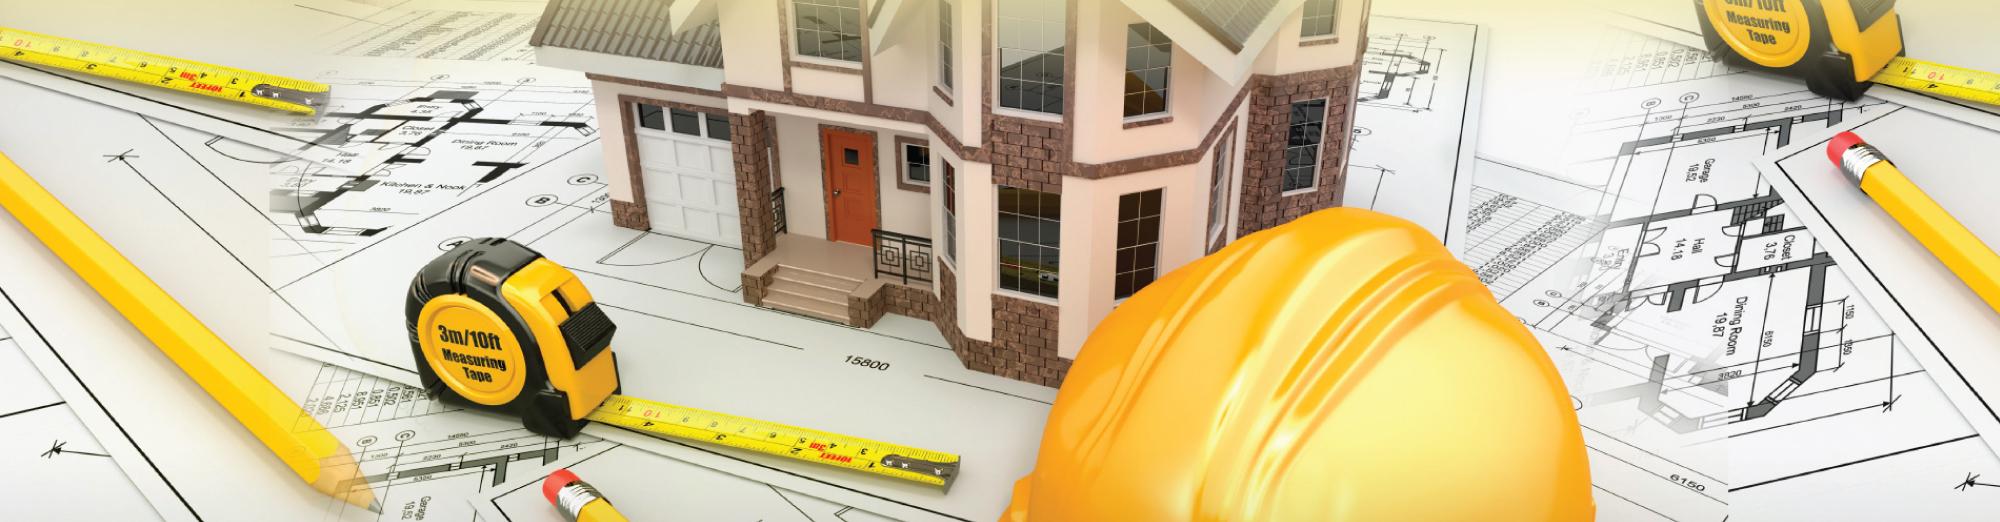 General Contractors Houston Texas - Unique Builders of Texas